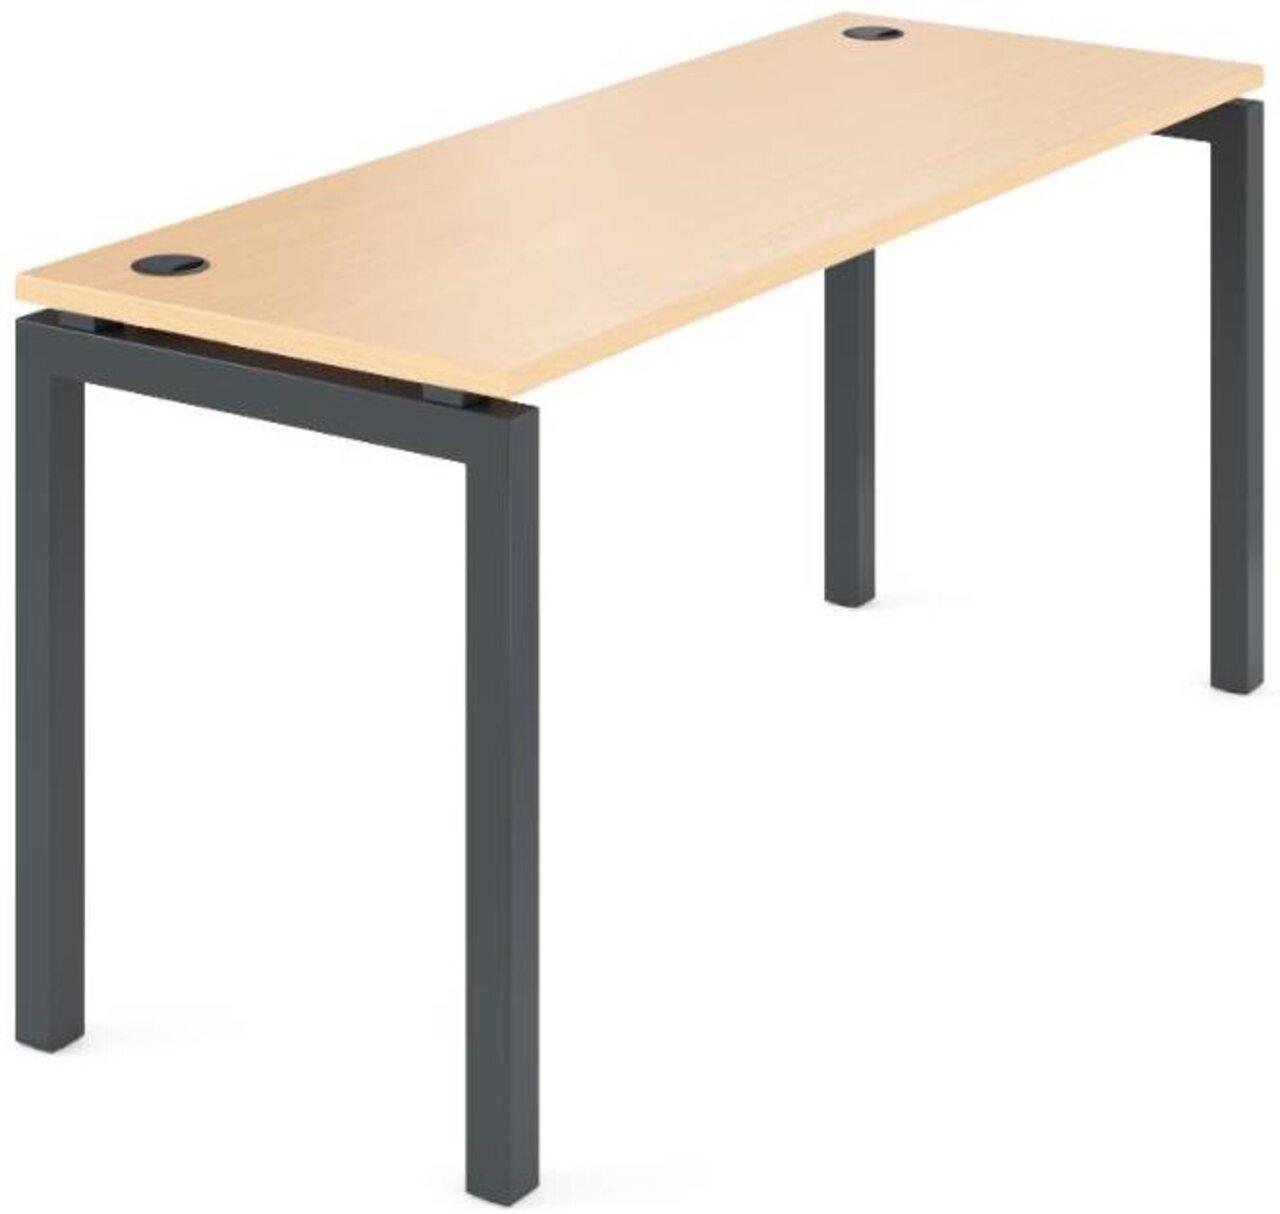 Стол на металлокаркасе  Арго 160x60x76 - фото 7